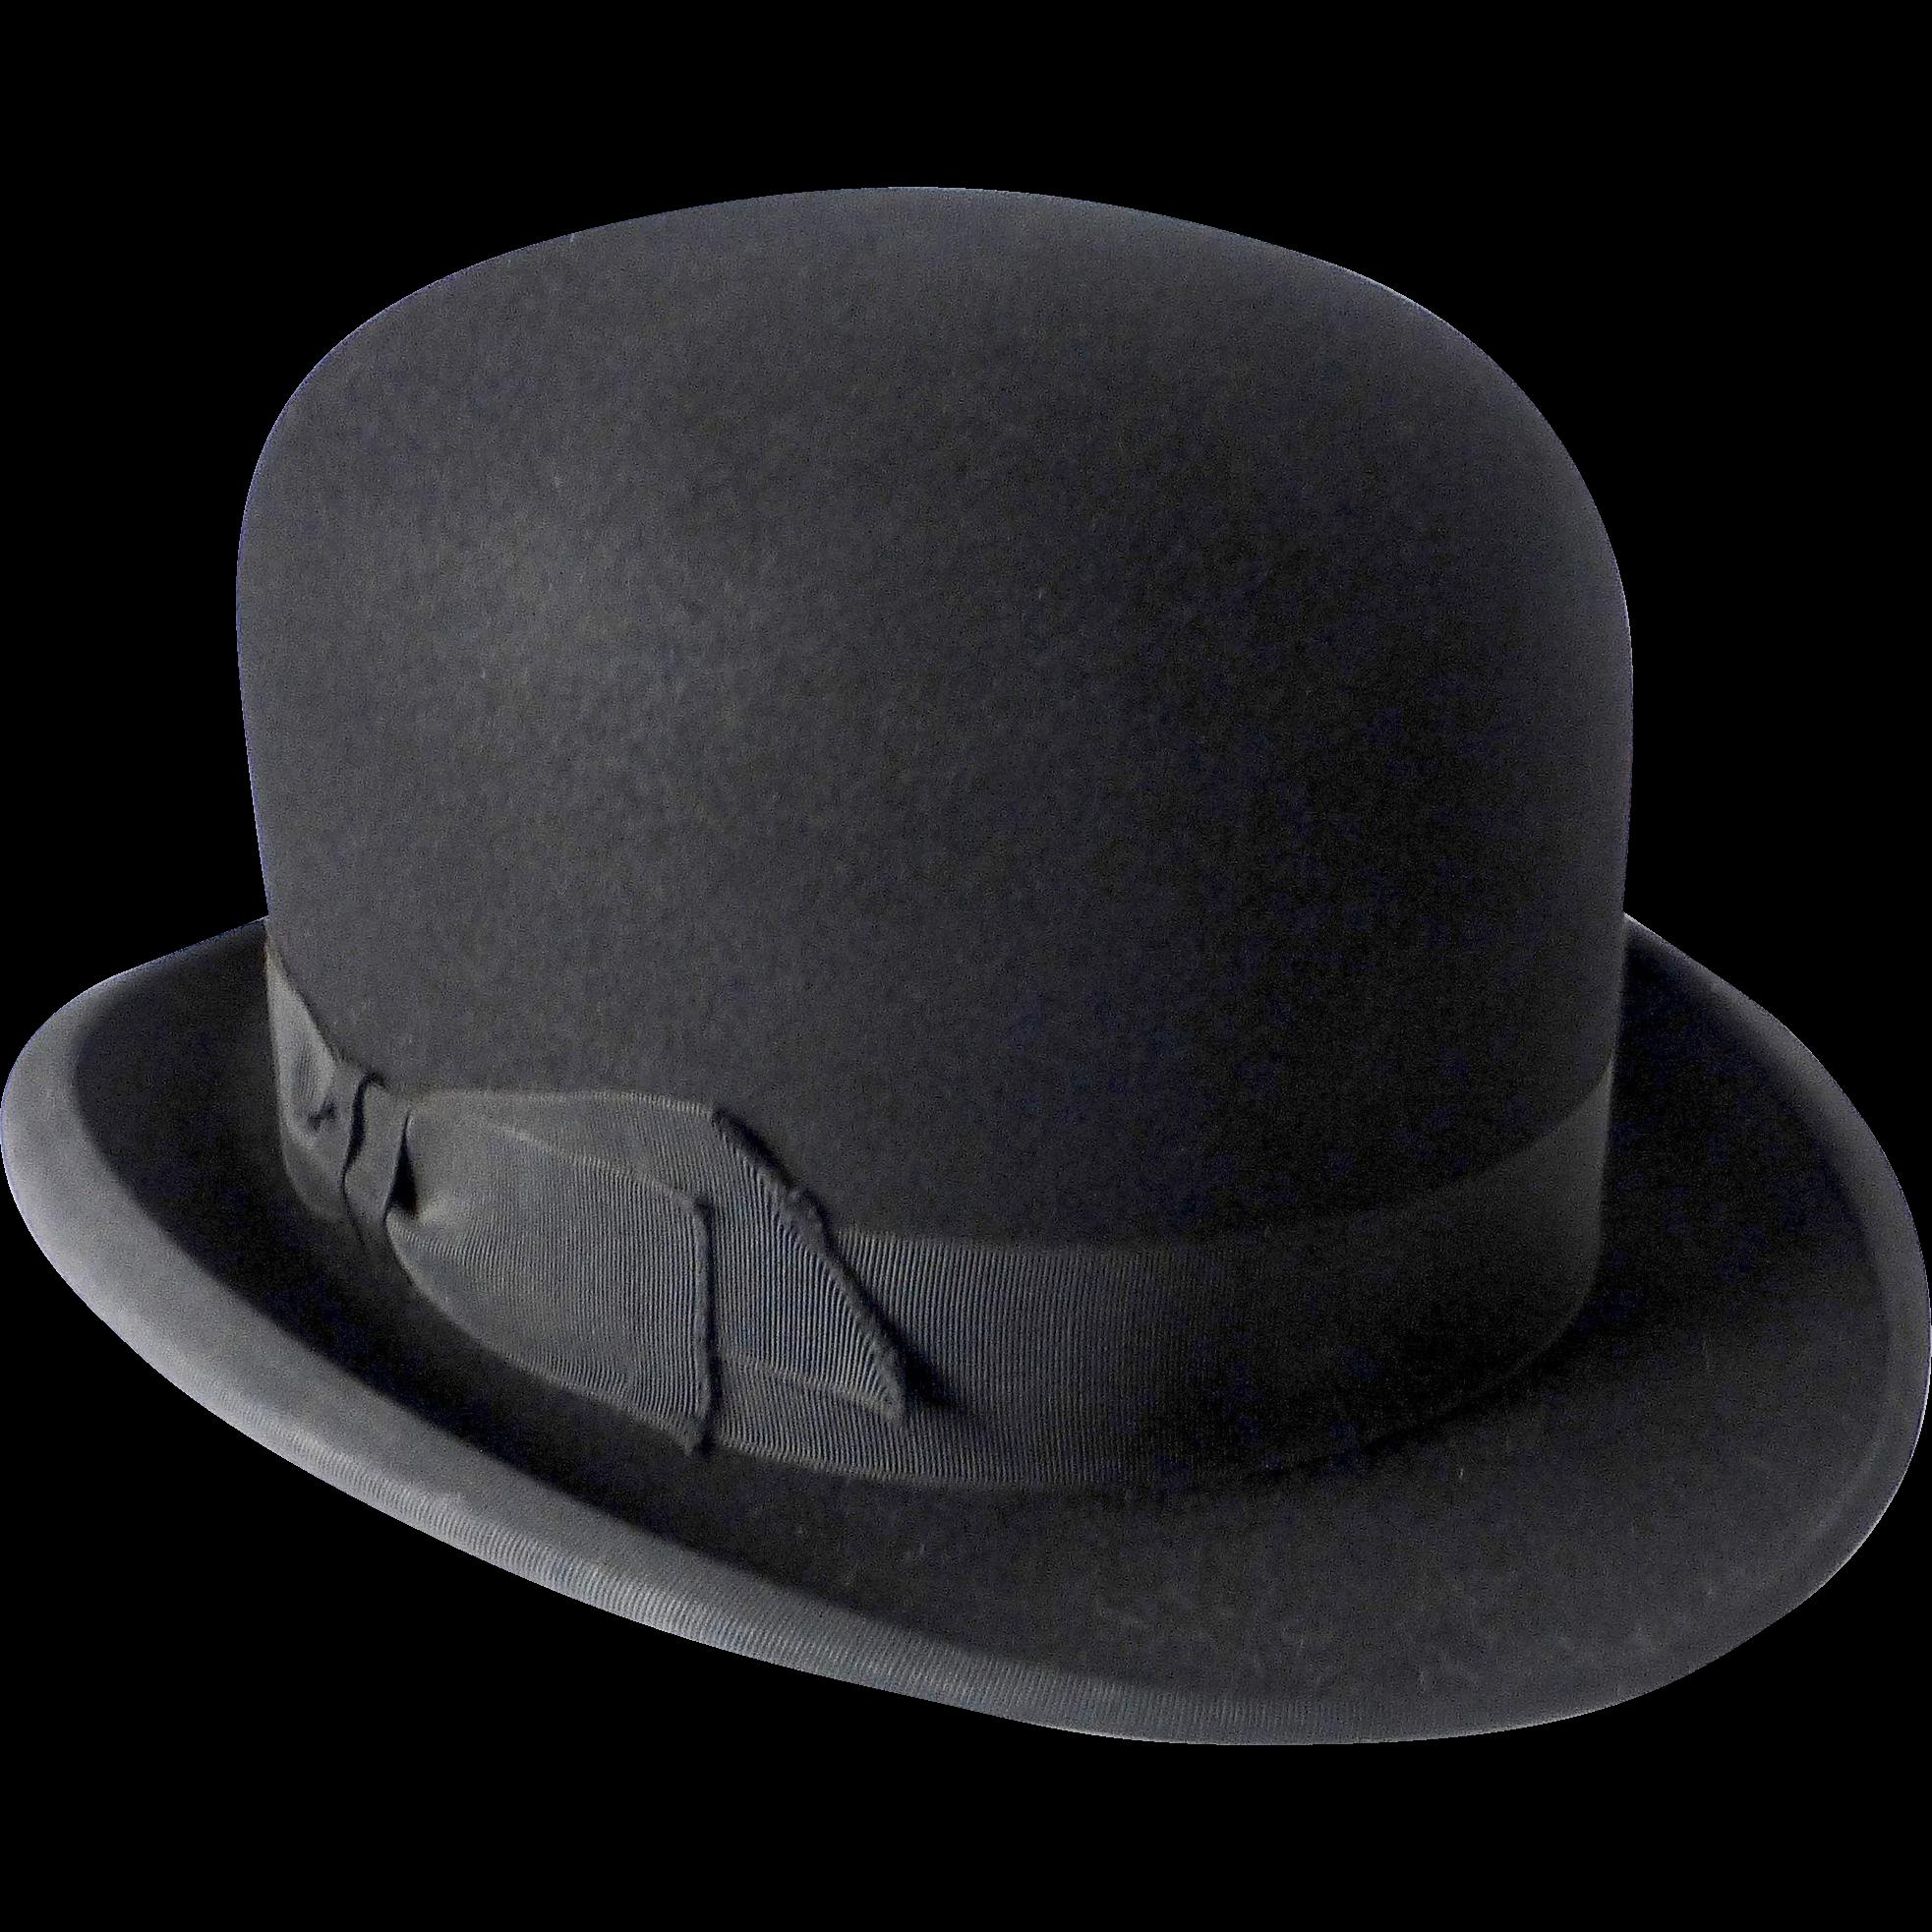 Black Fine Felted Wool Derby Bowler Hat